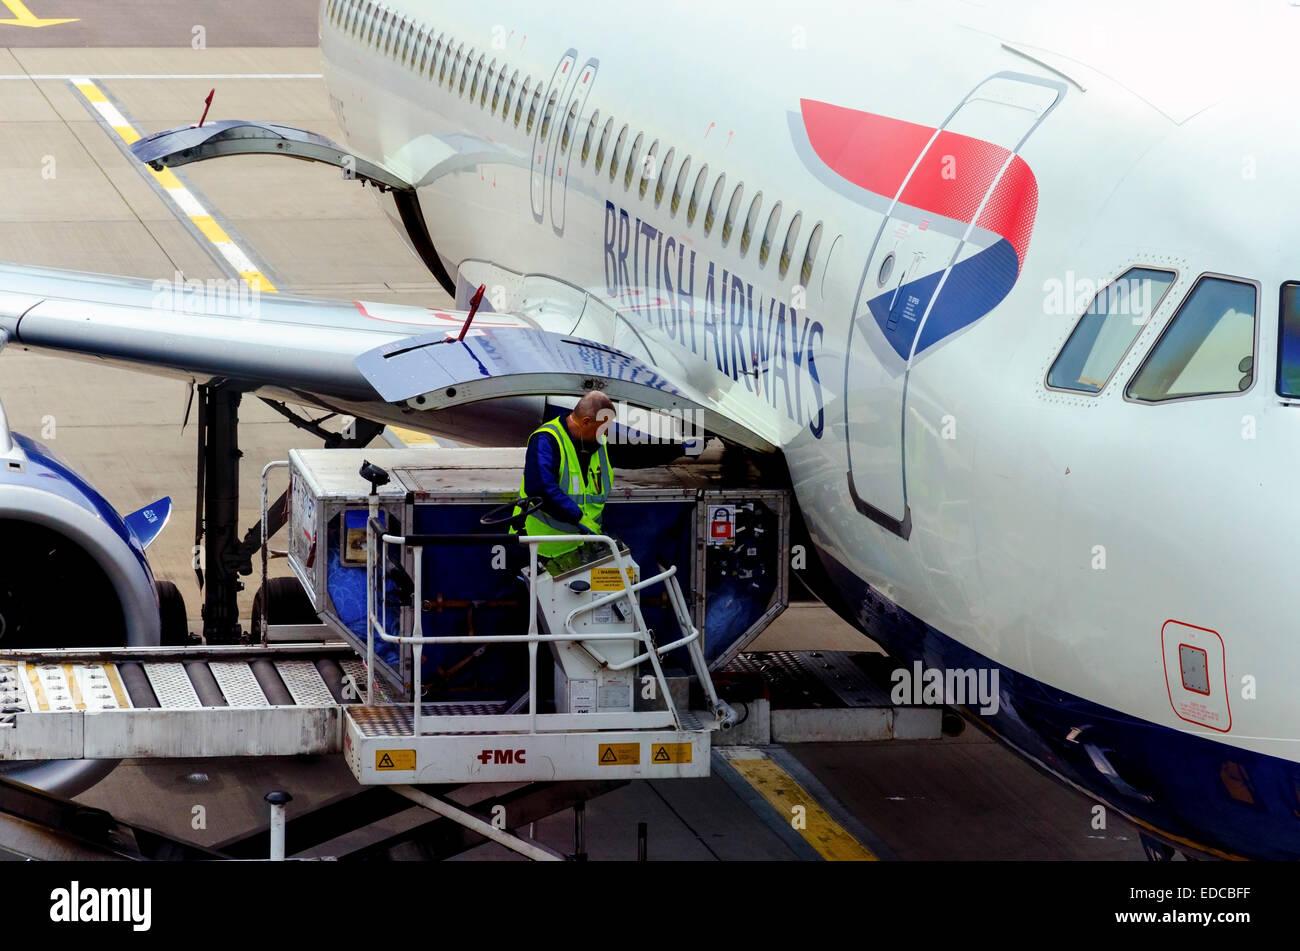 BA plane loading at Heathrow - Stock Image